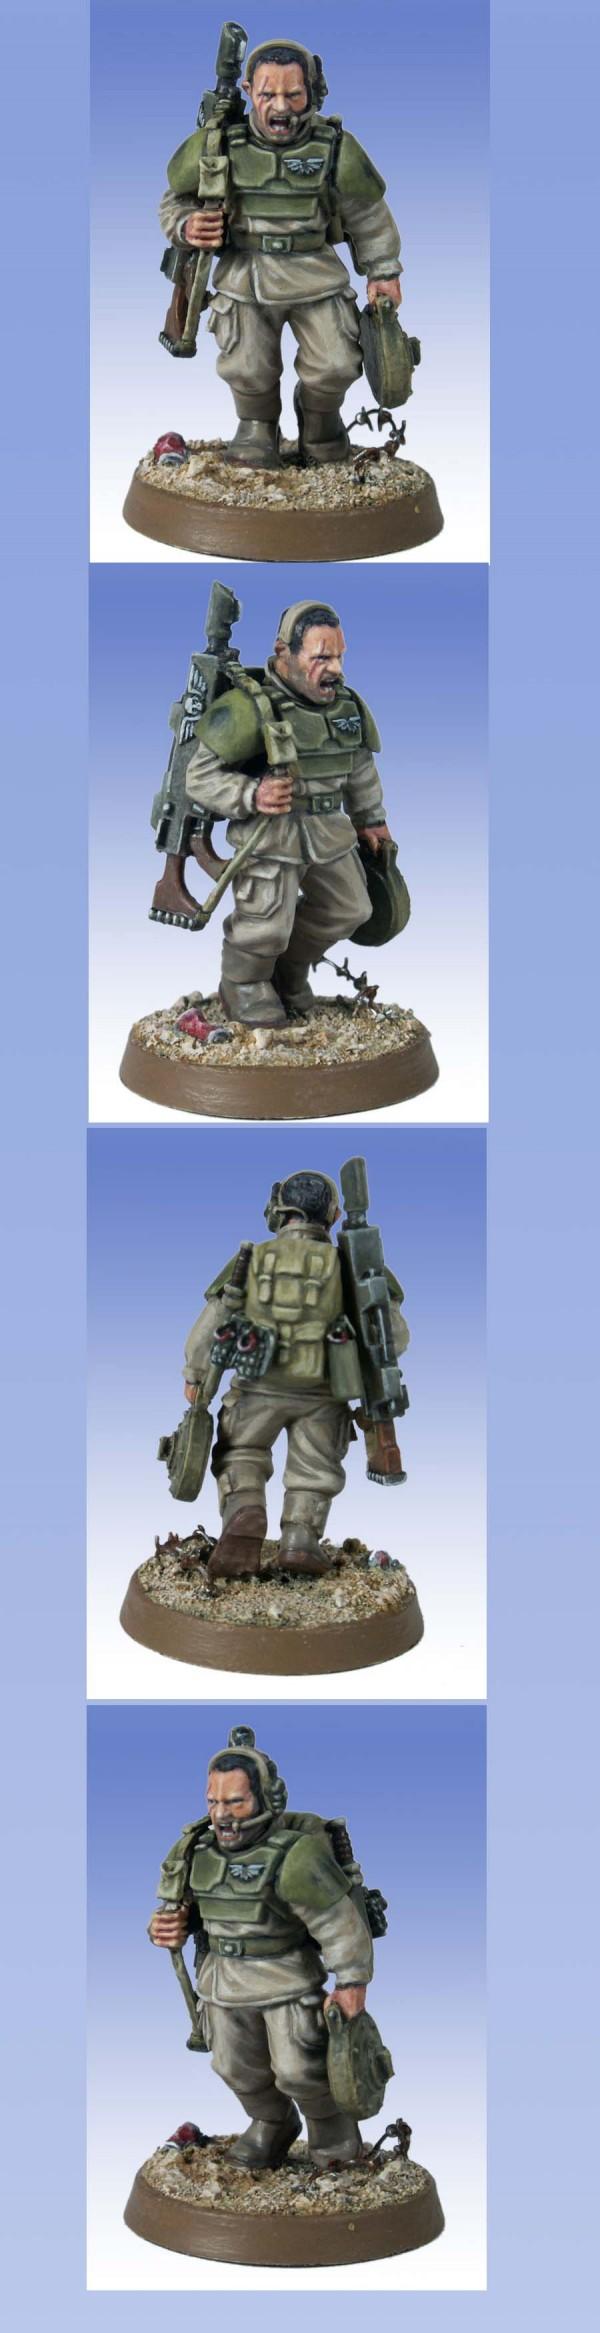 Imperial Guard Cadian Grunt Sgnt Krom